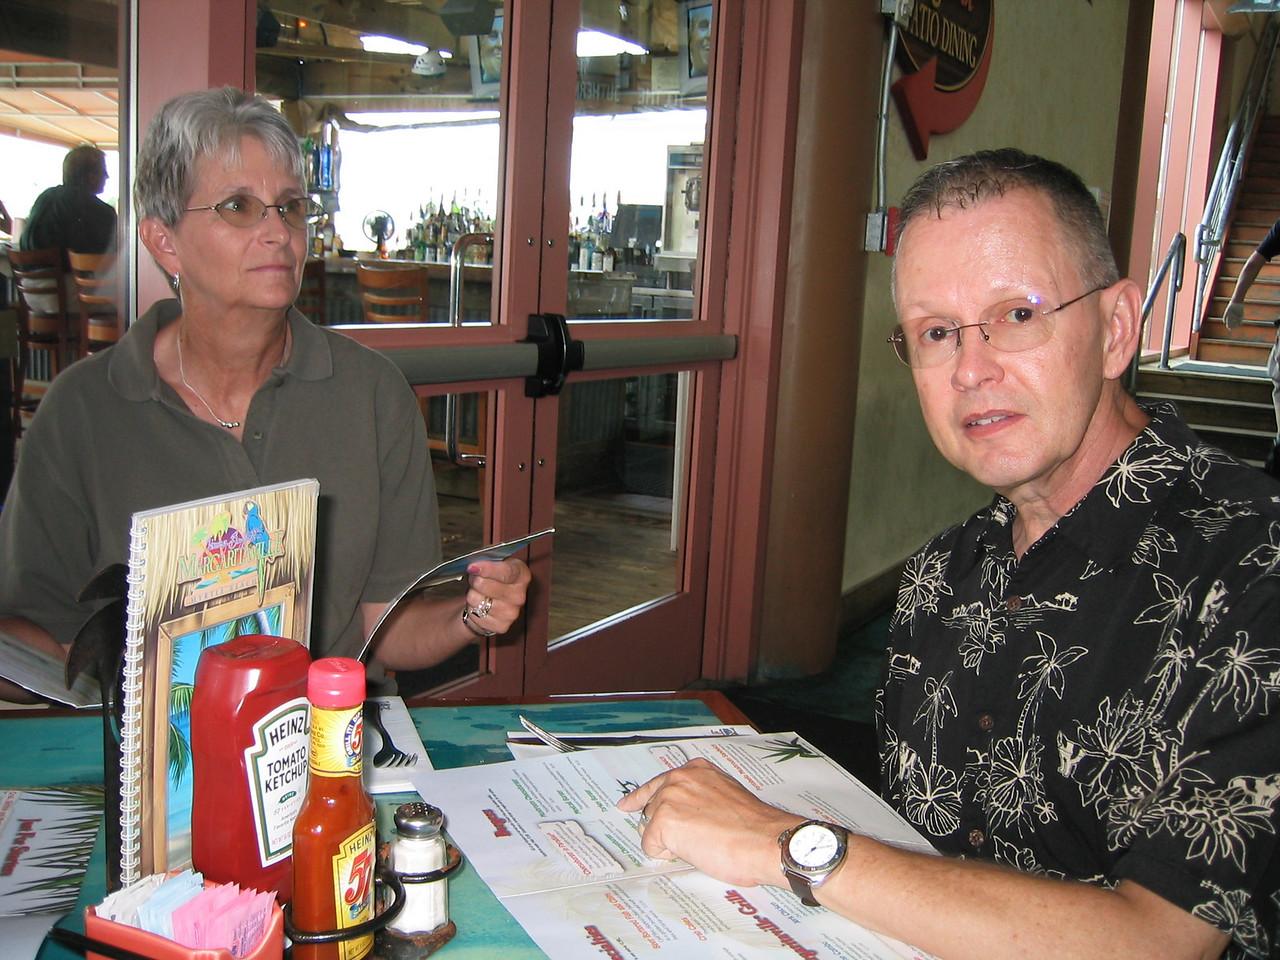 Margaritaville, Myrtle Beach, 2006